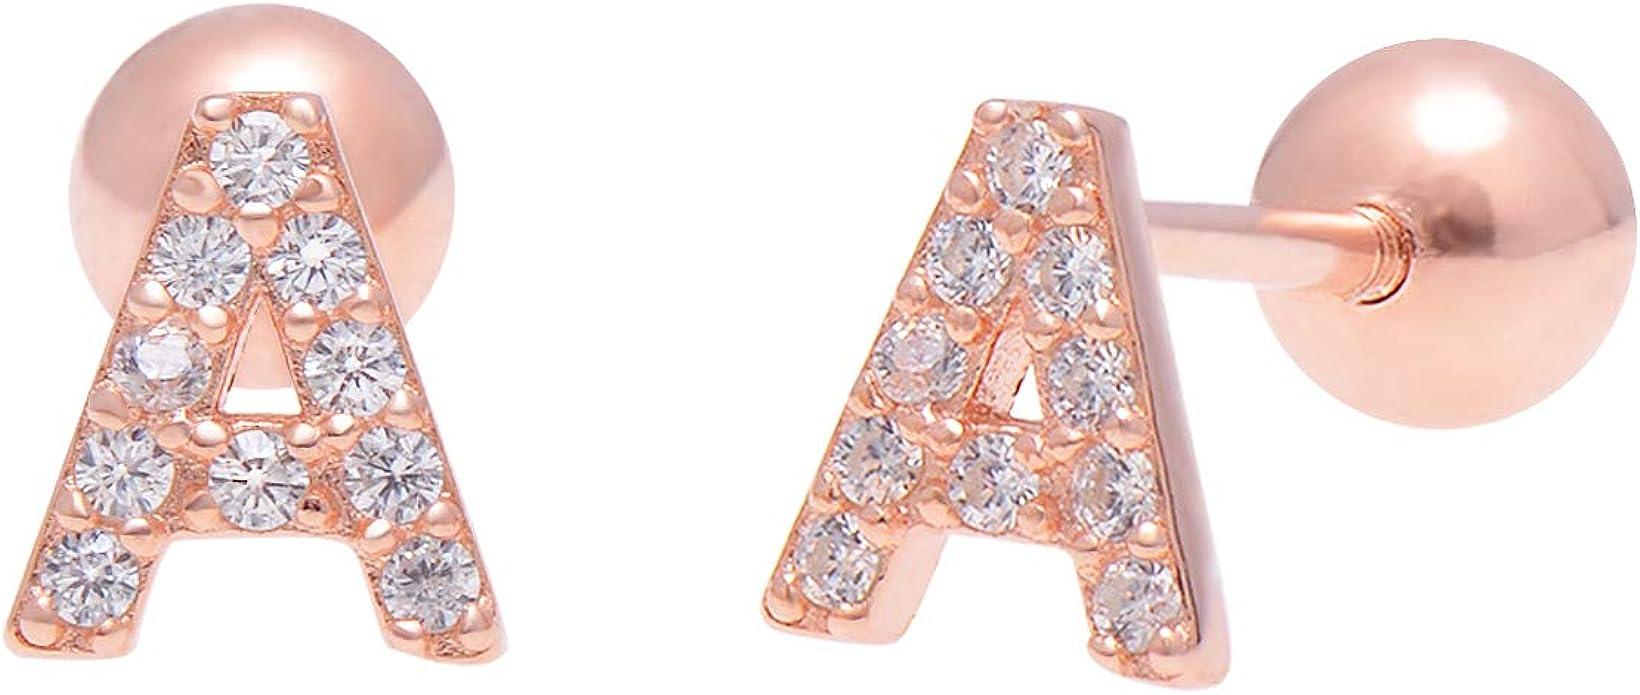 5mm 18K White Gold Flower with Pink Zz Screwback earrings